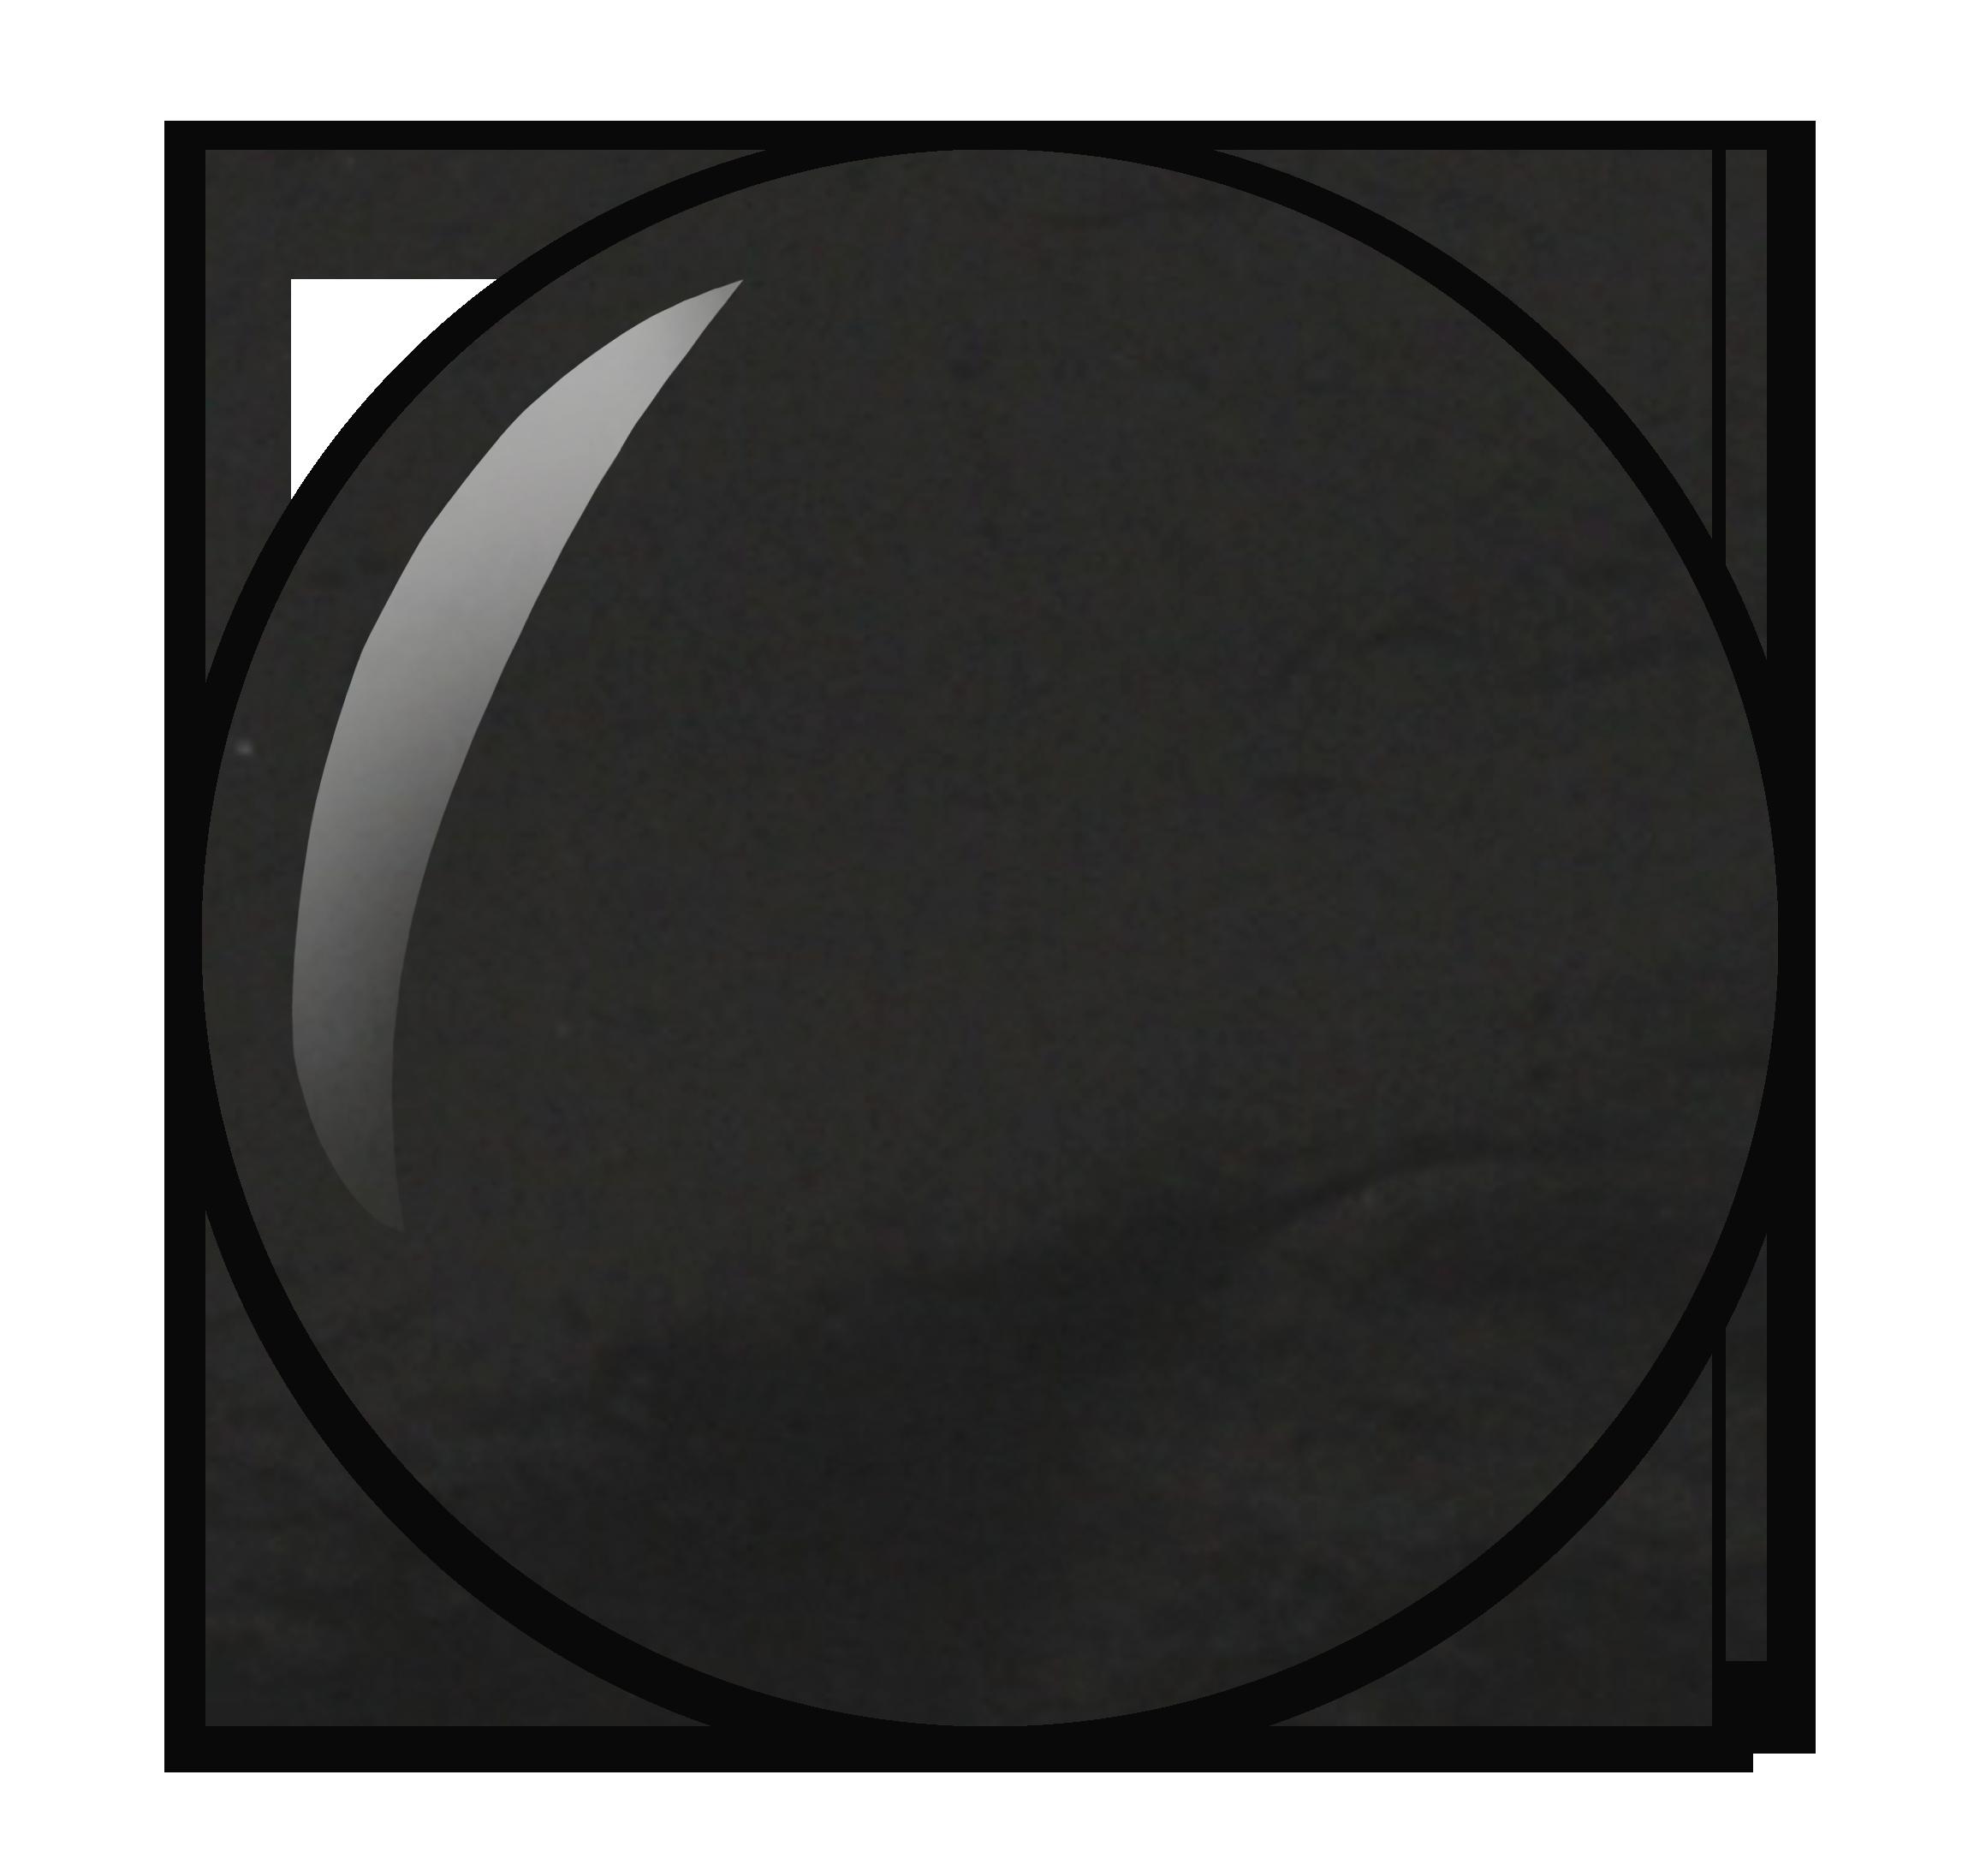 Zwarte nagellak nummer 72 uit nagellak collectie